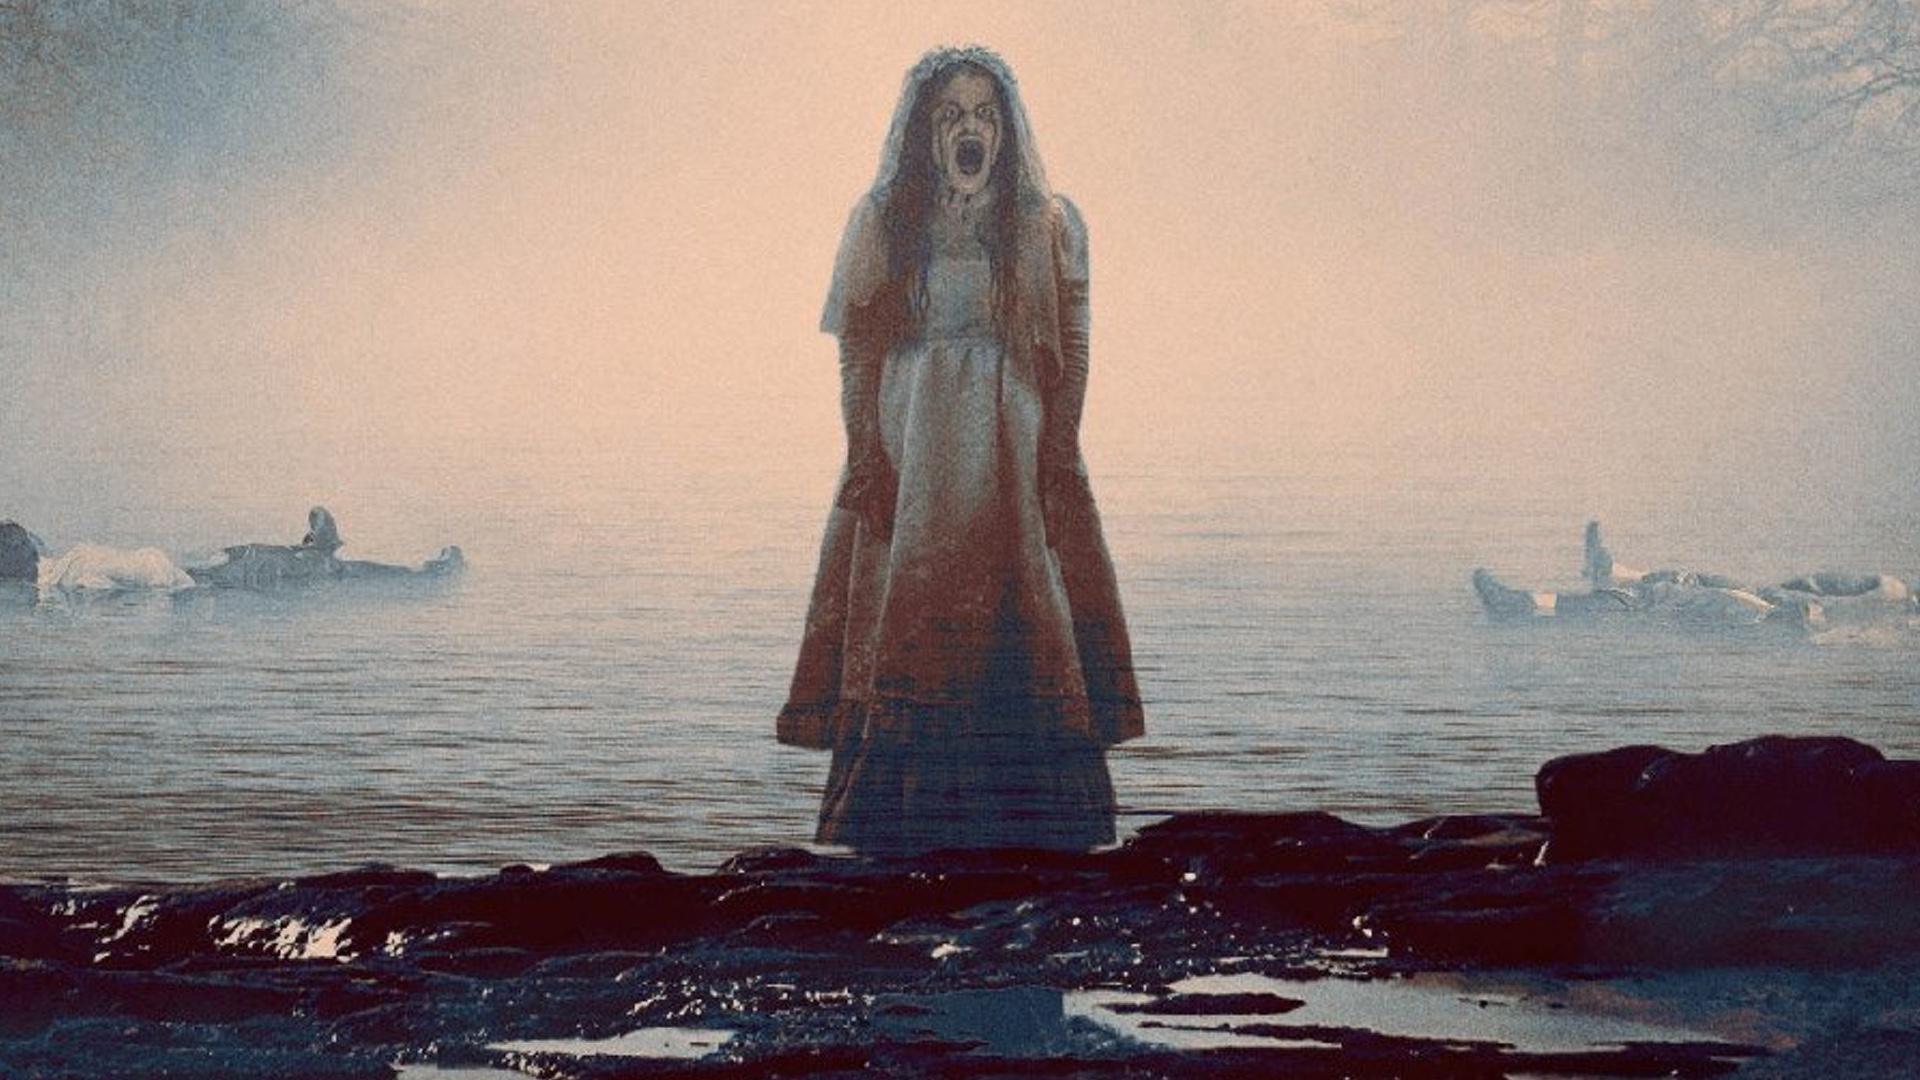 Frightening Trailer For The James Wan Produced Horror Film The Curse Of La Llorona Geektyrant